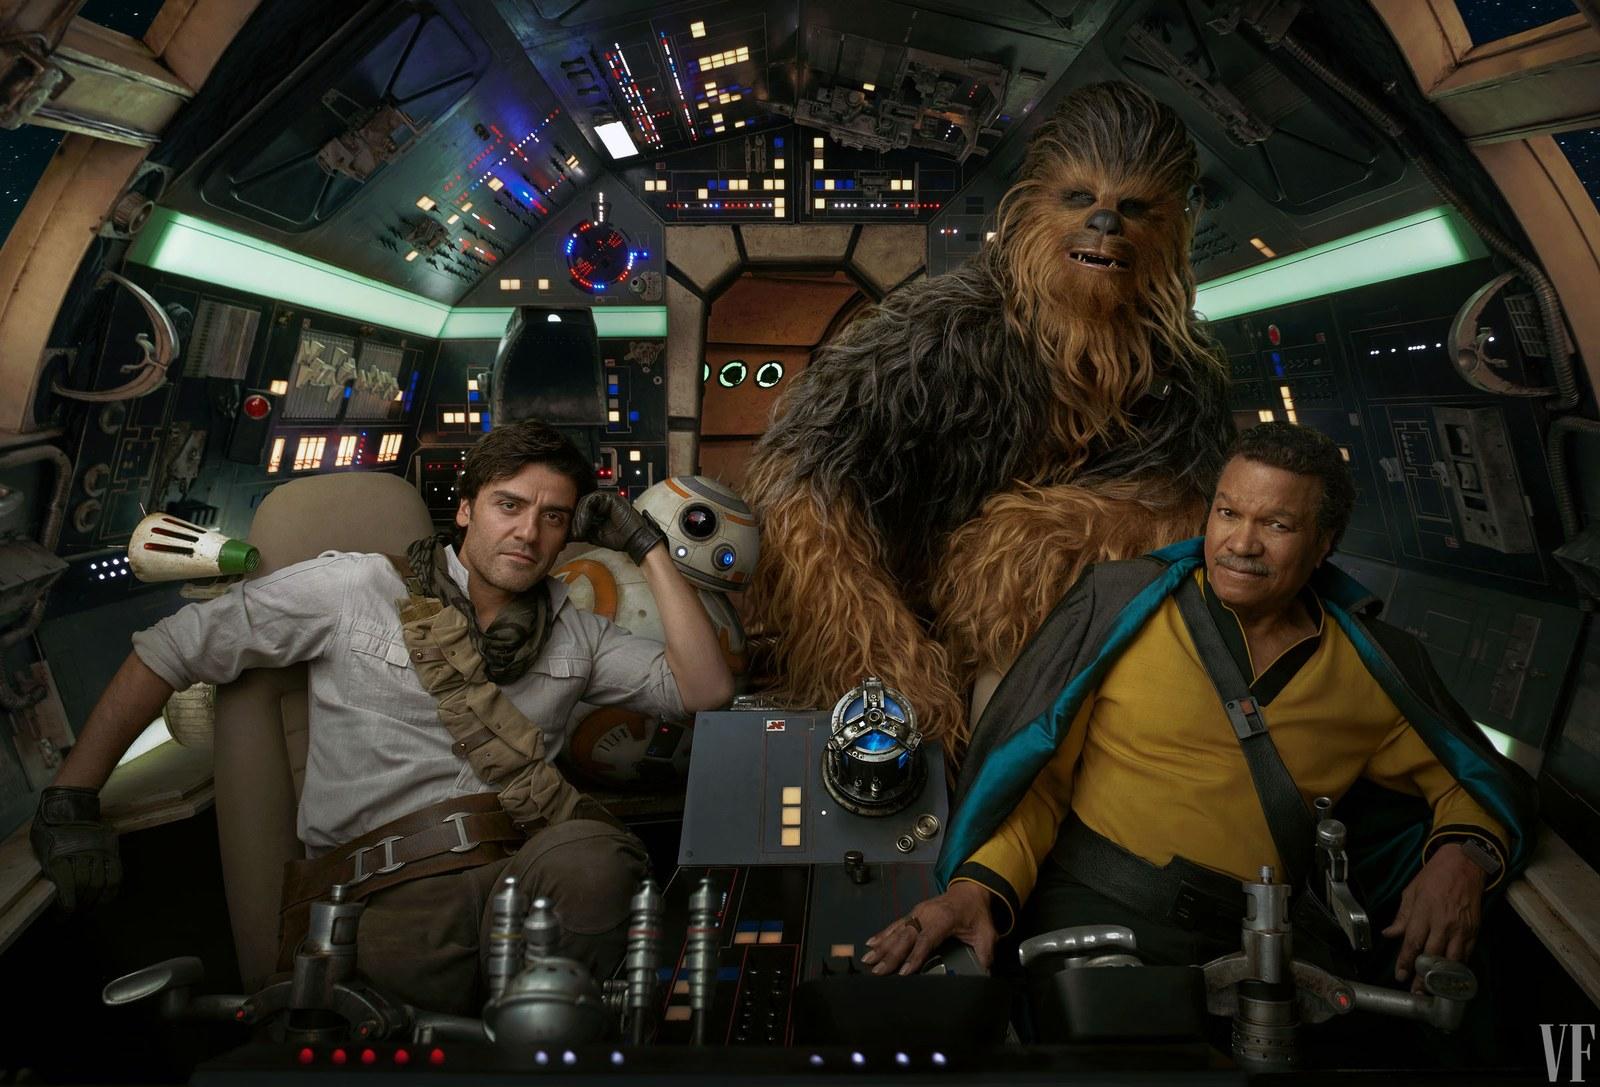 Star Wars: L'ascesa di Skywalker, le nuove immagini ufficiali! thumbnail